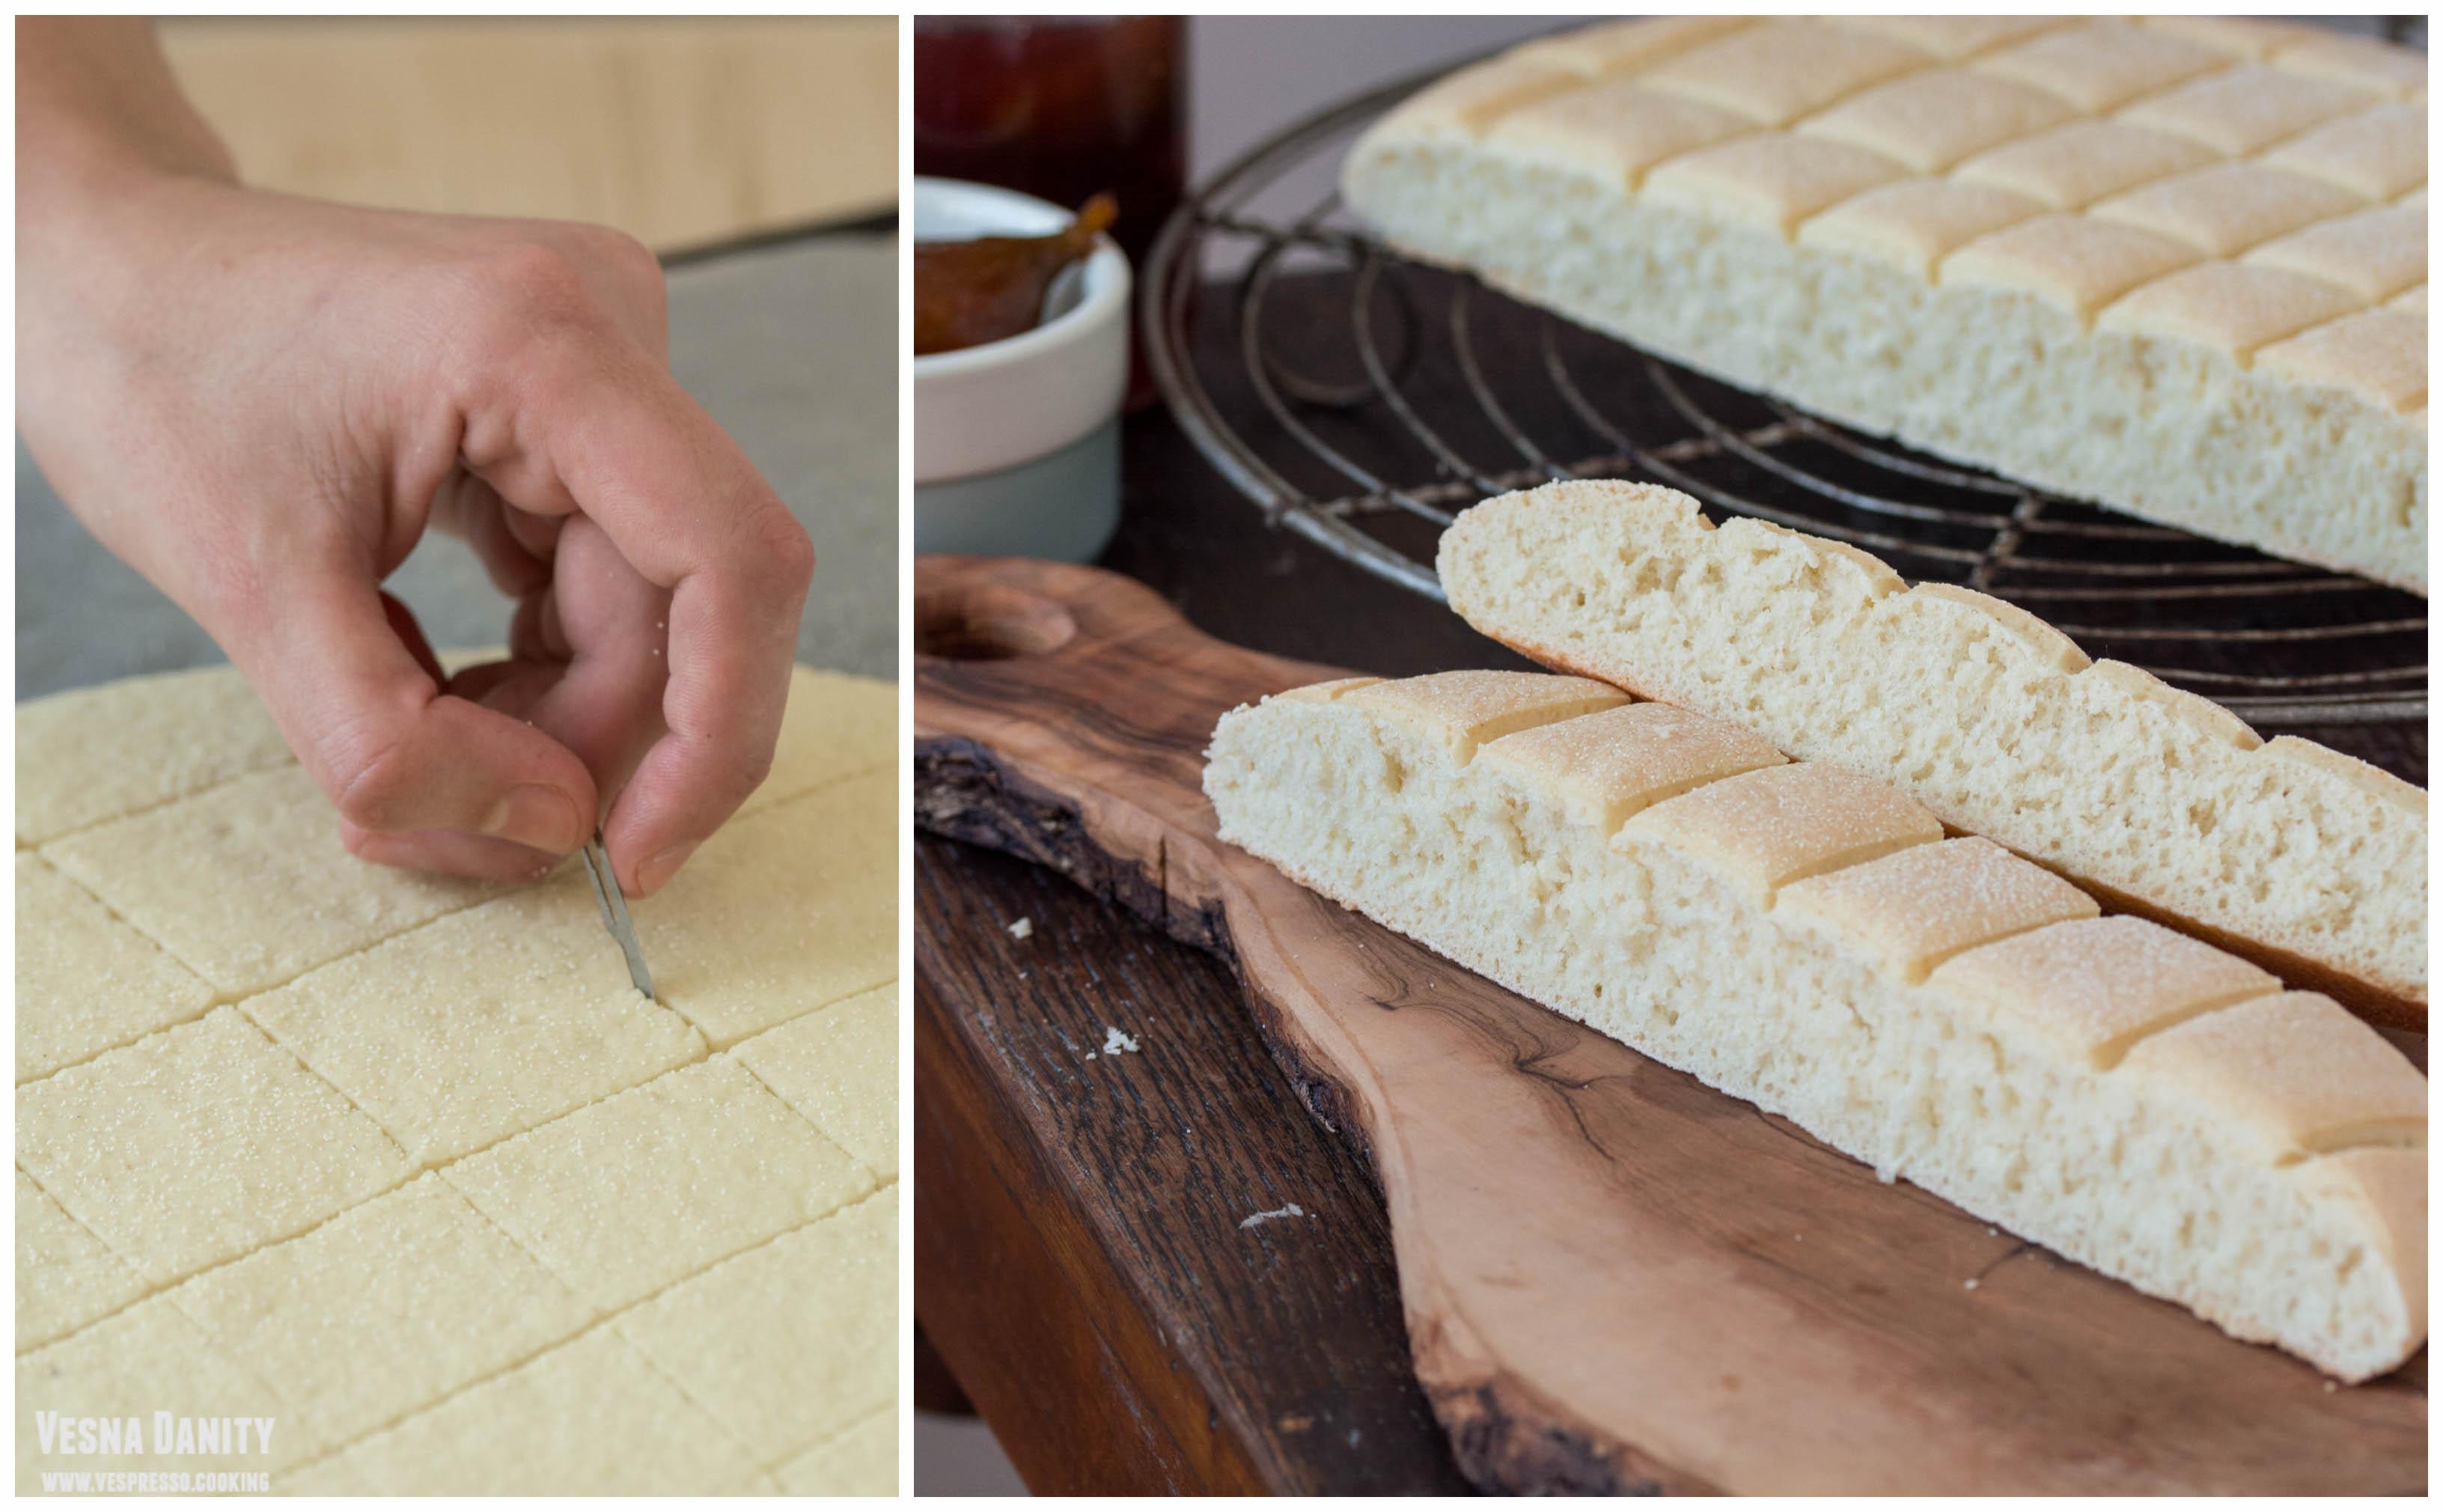 Pâine marocană cu griș – Khobz dyal Smida (vegan / de post)